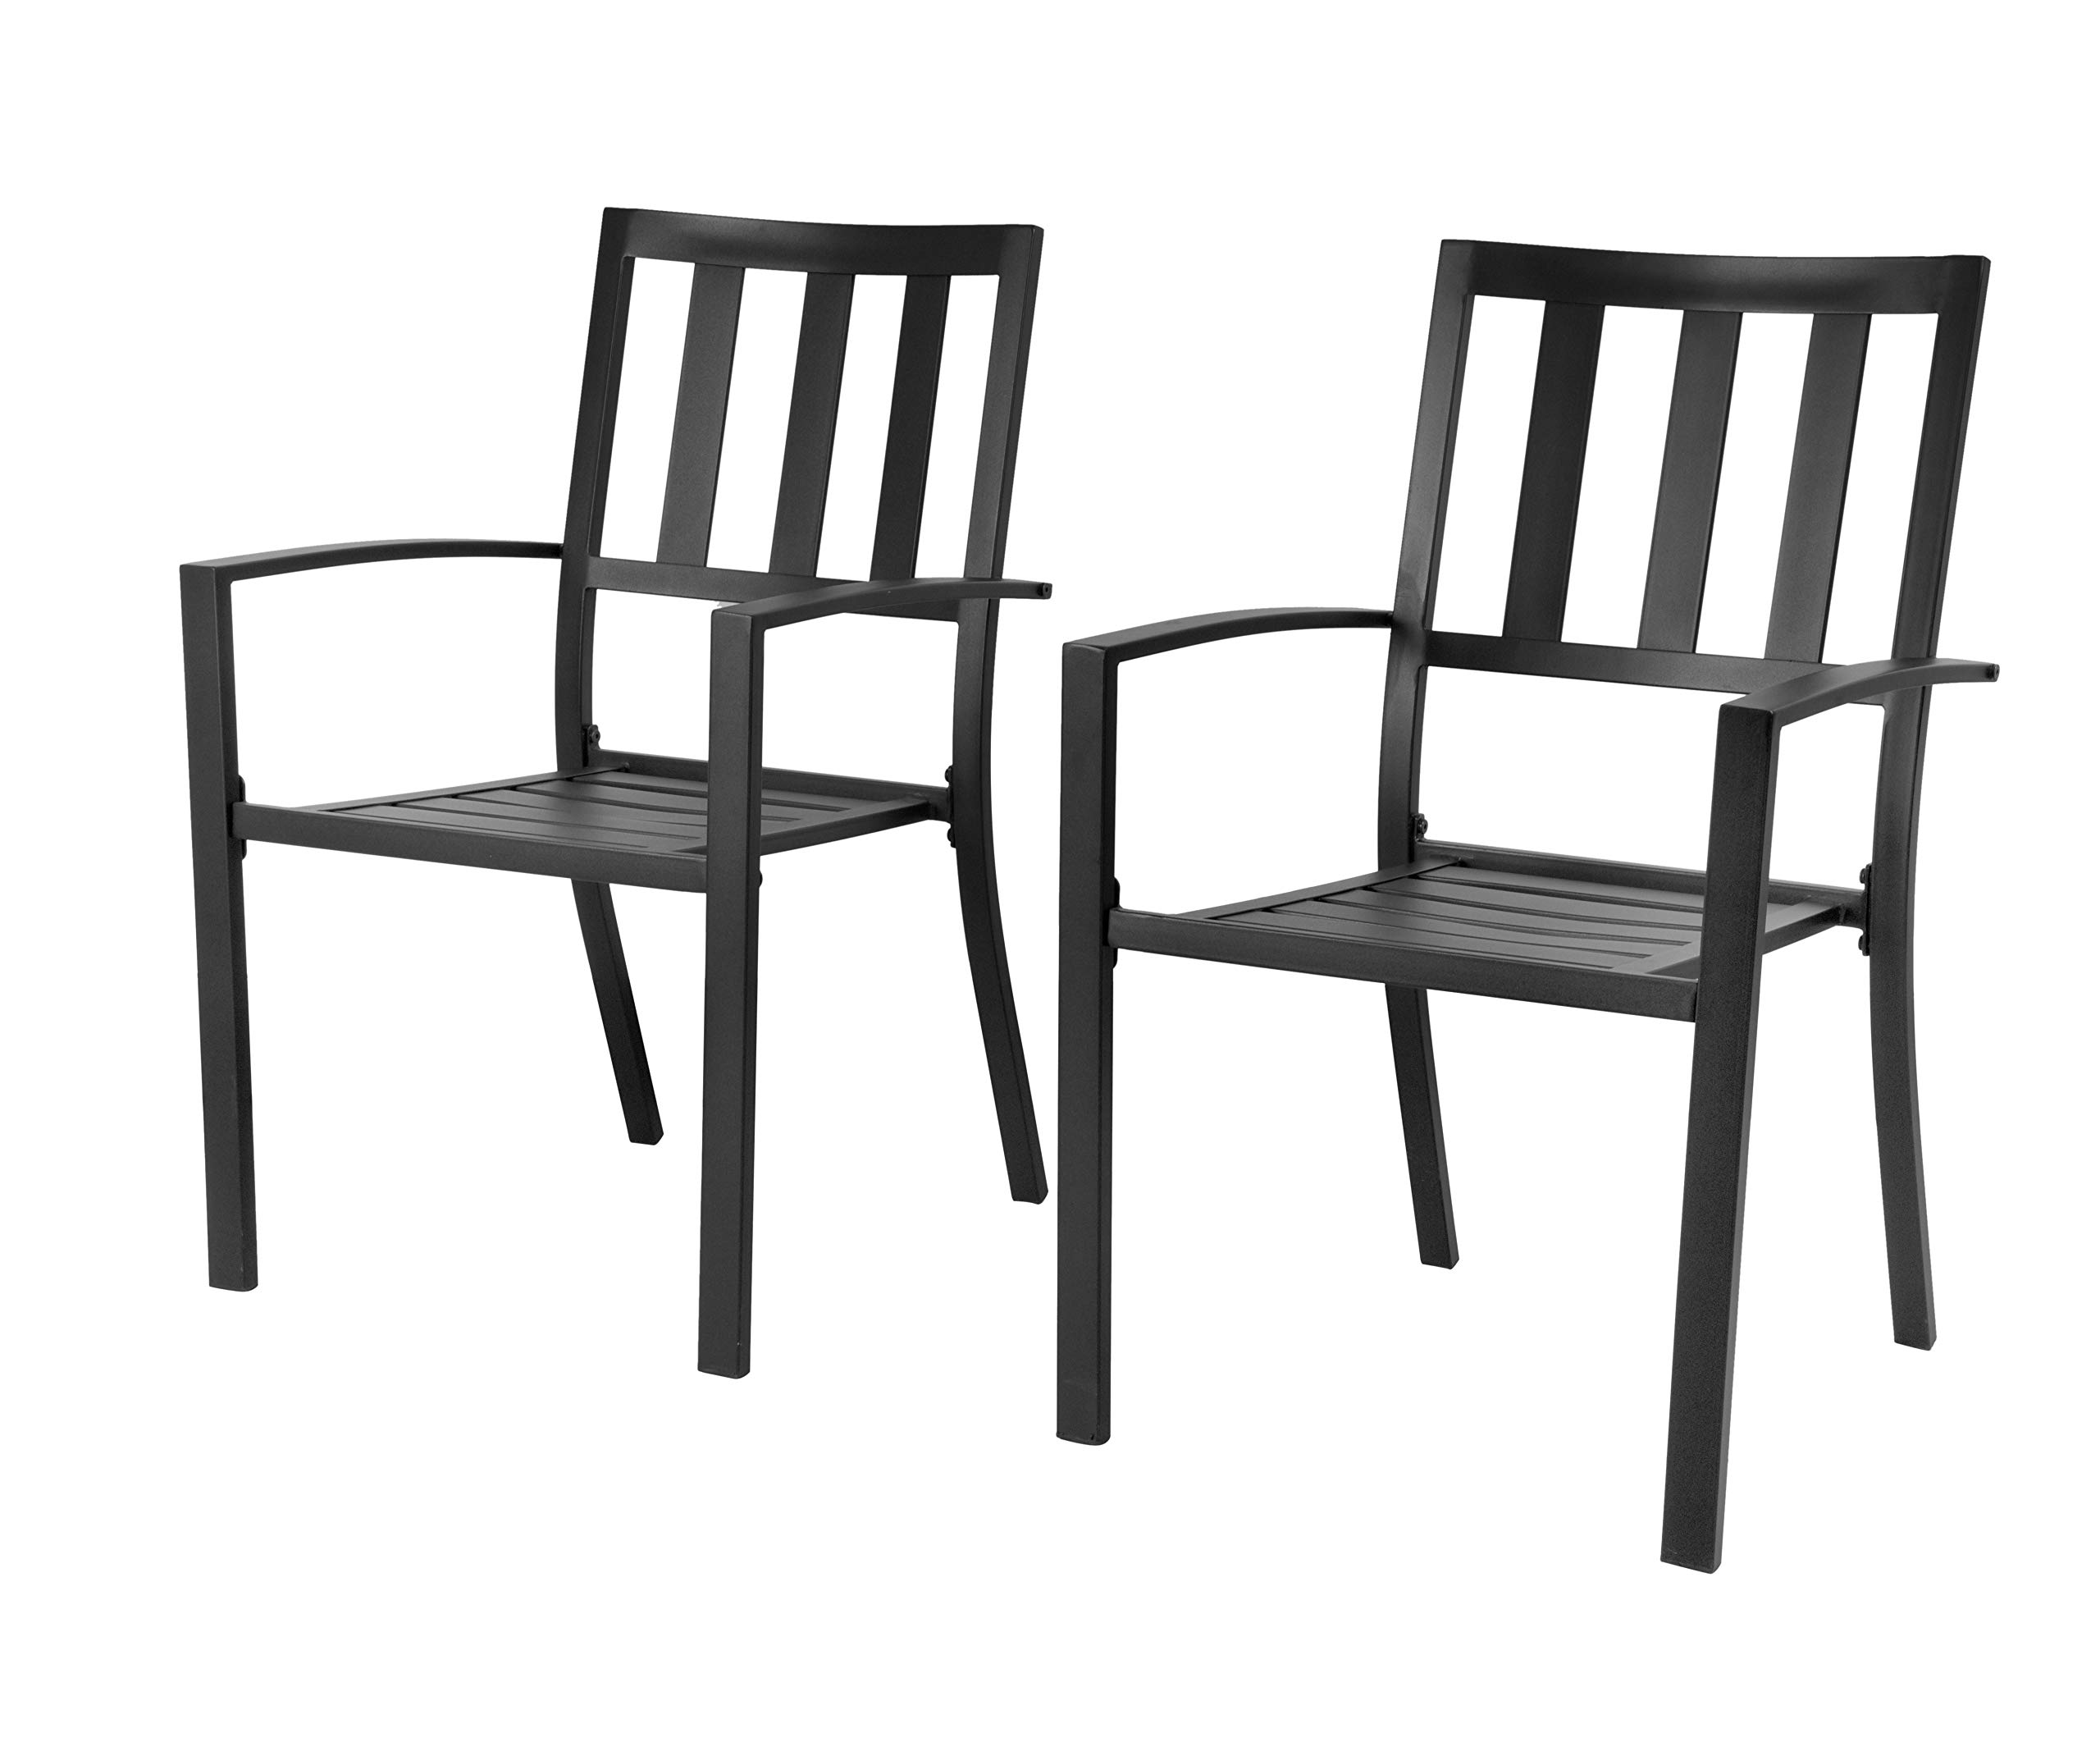 EMERIT Patio Wrought Metal Indoor Outdoor Stackable Dining Arm Chairs Set of 2,Black